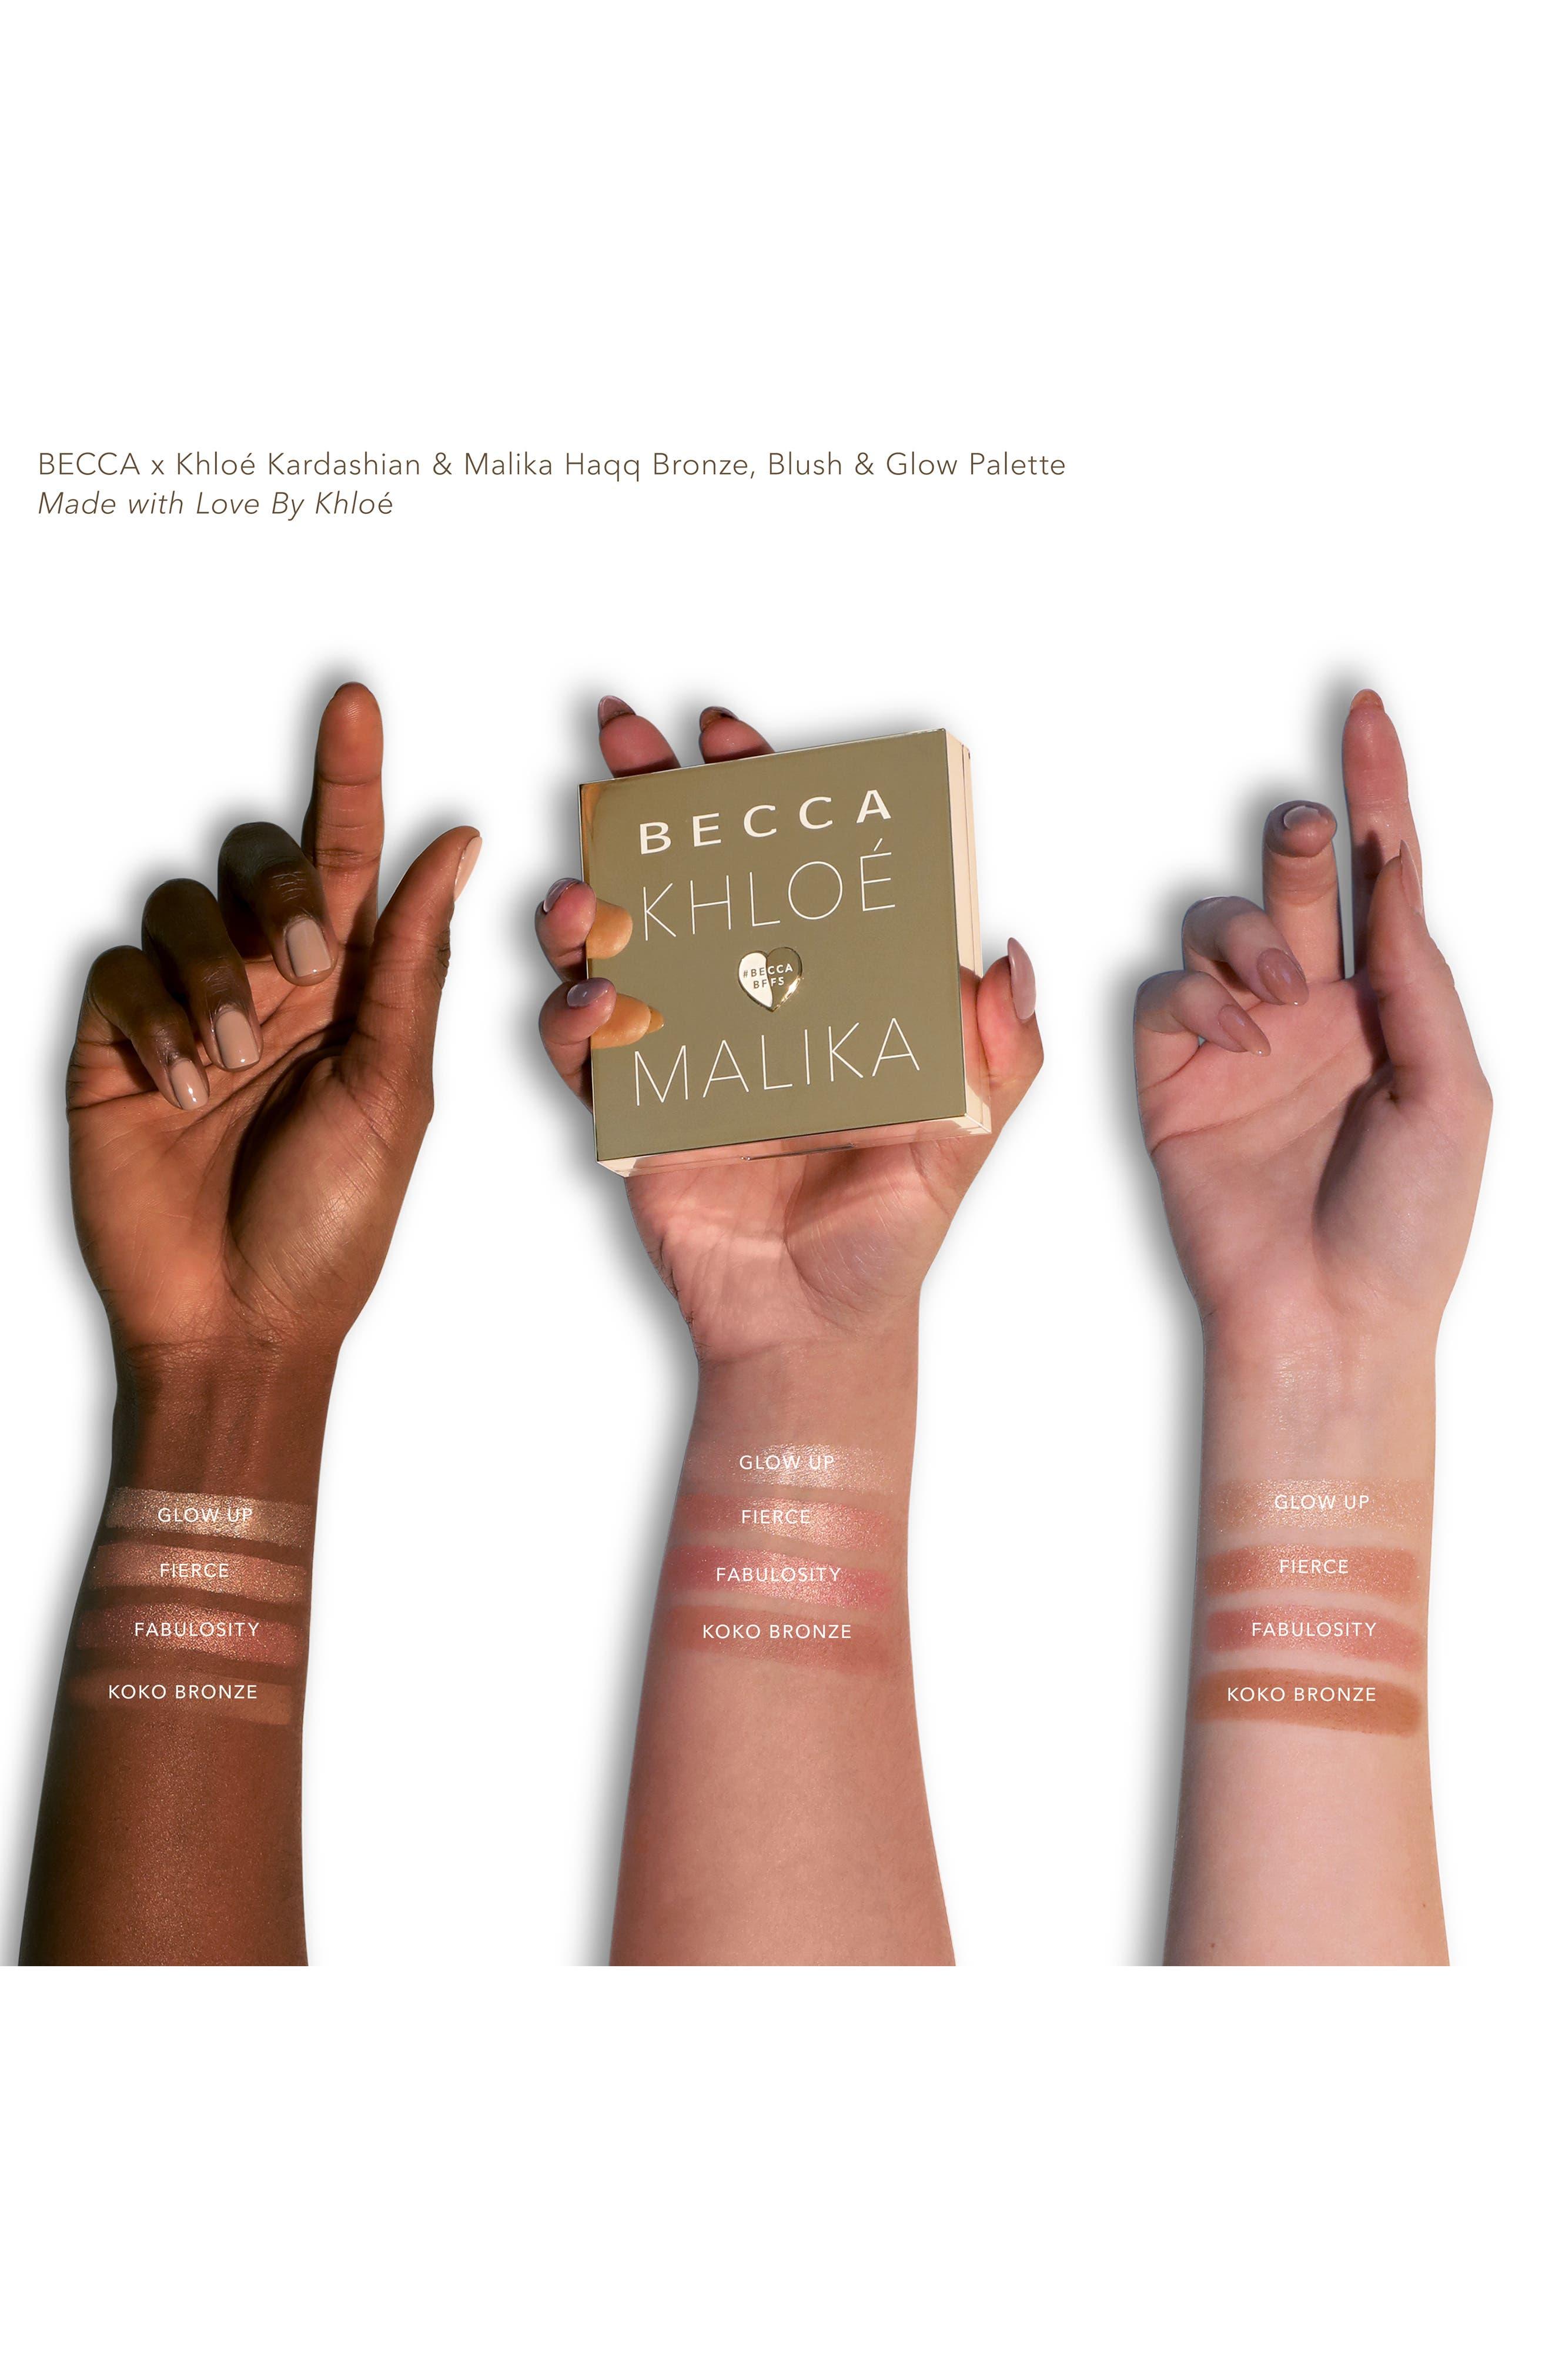 BECCA COSMETICS, BECCA x Khloé Kardashian & Malika Haqq Bronze, Blush & Glow Palette, Alternate thumbnail 2, color, KHLOE